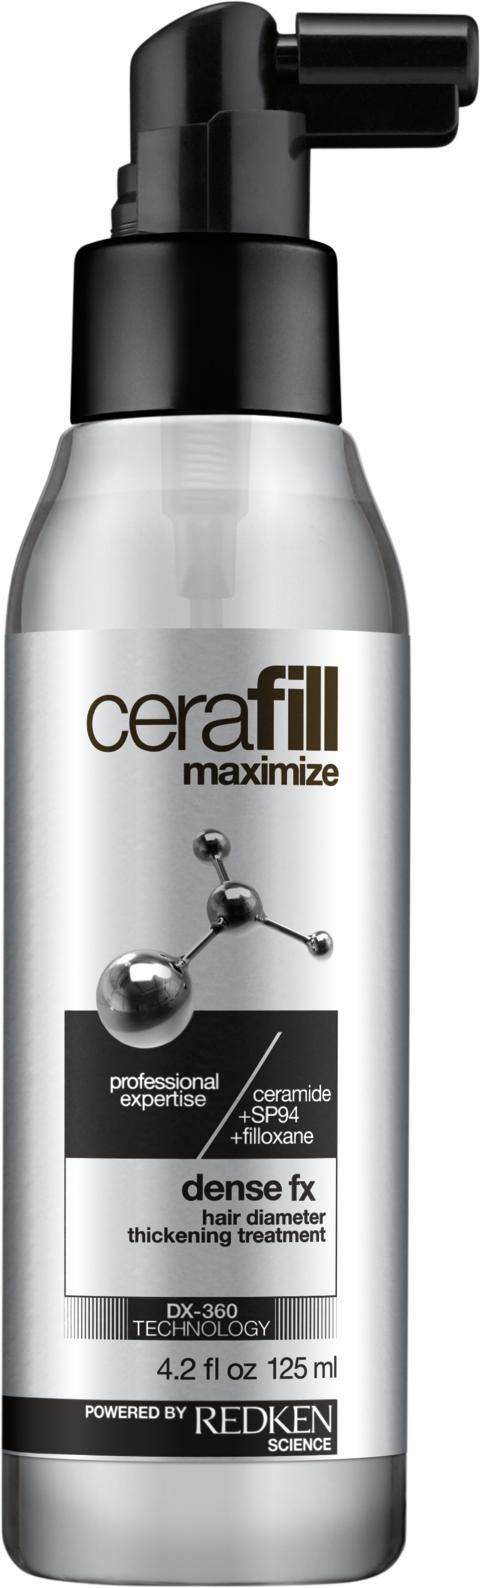 Redken Cerafill Maximize Dense FX Treatment